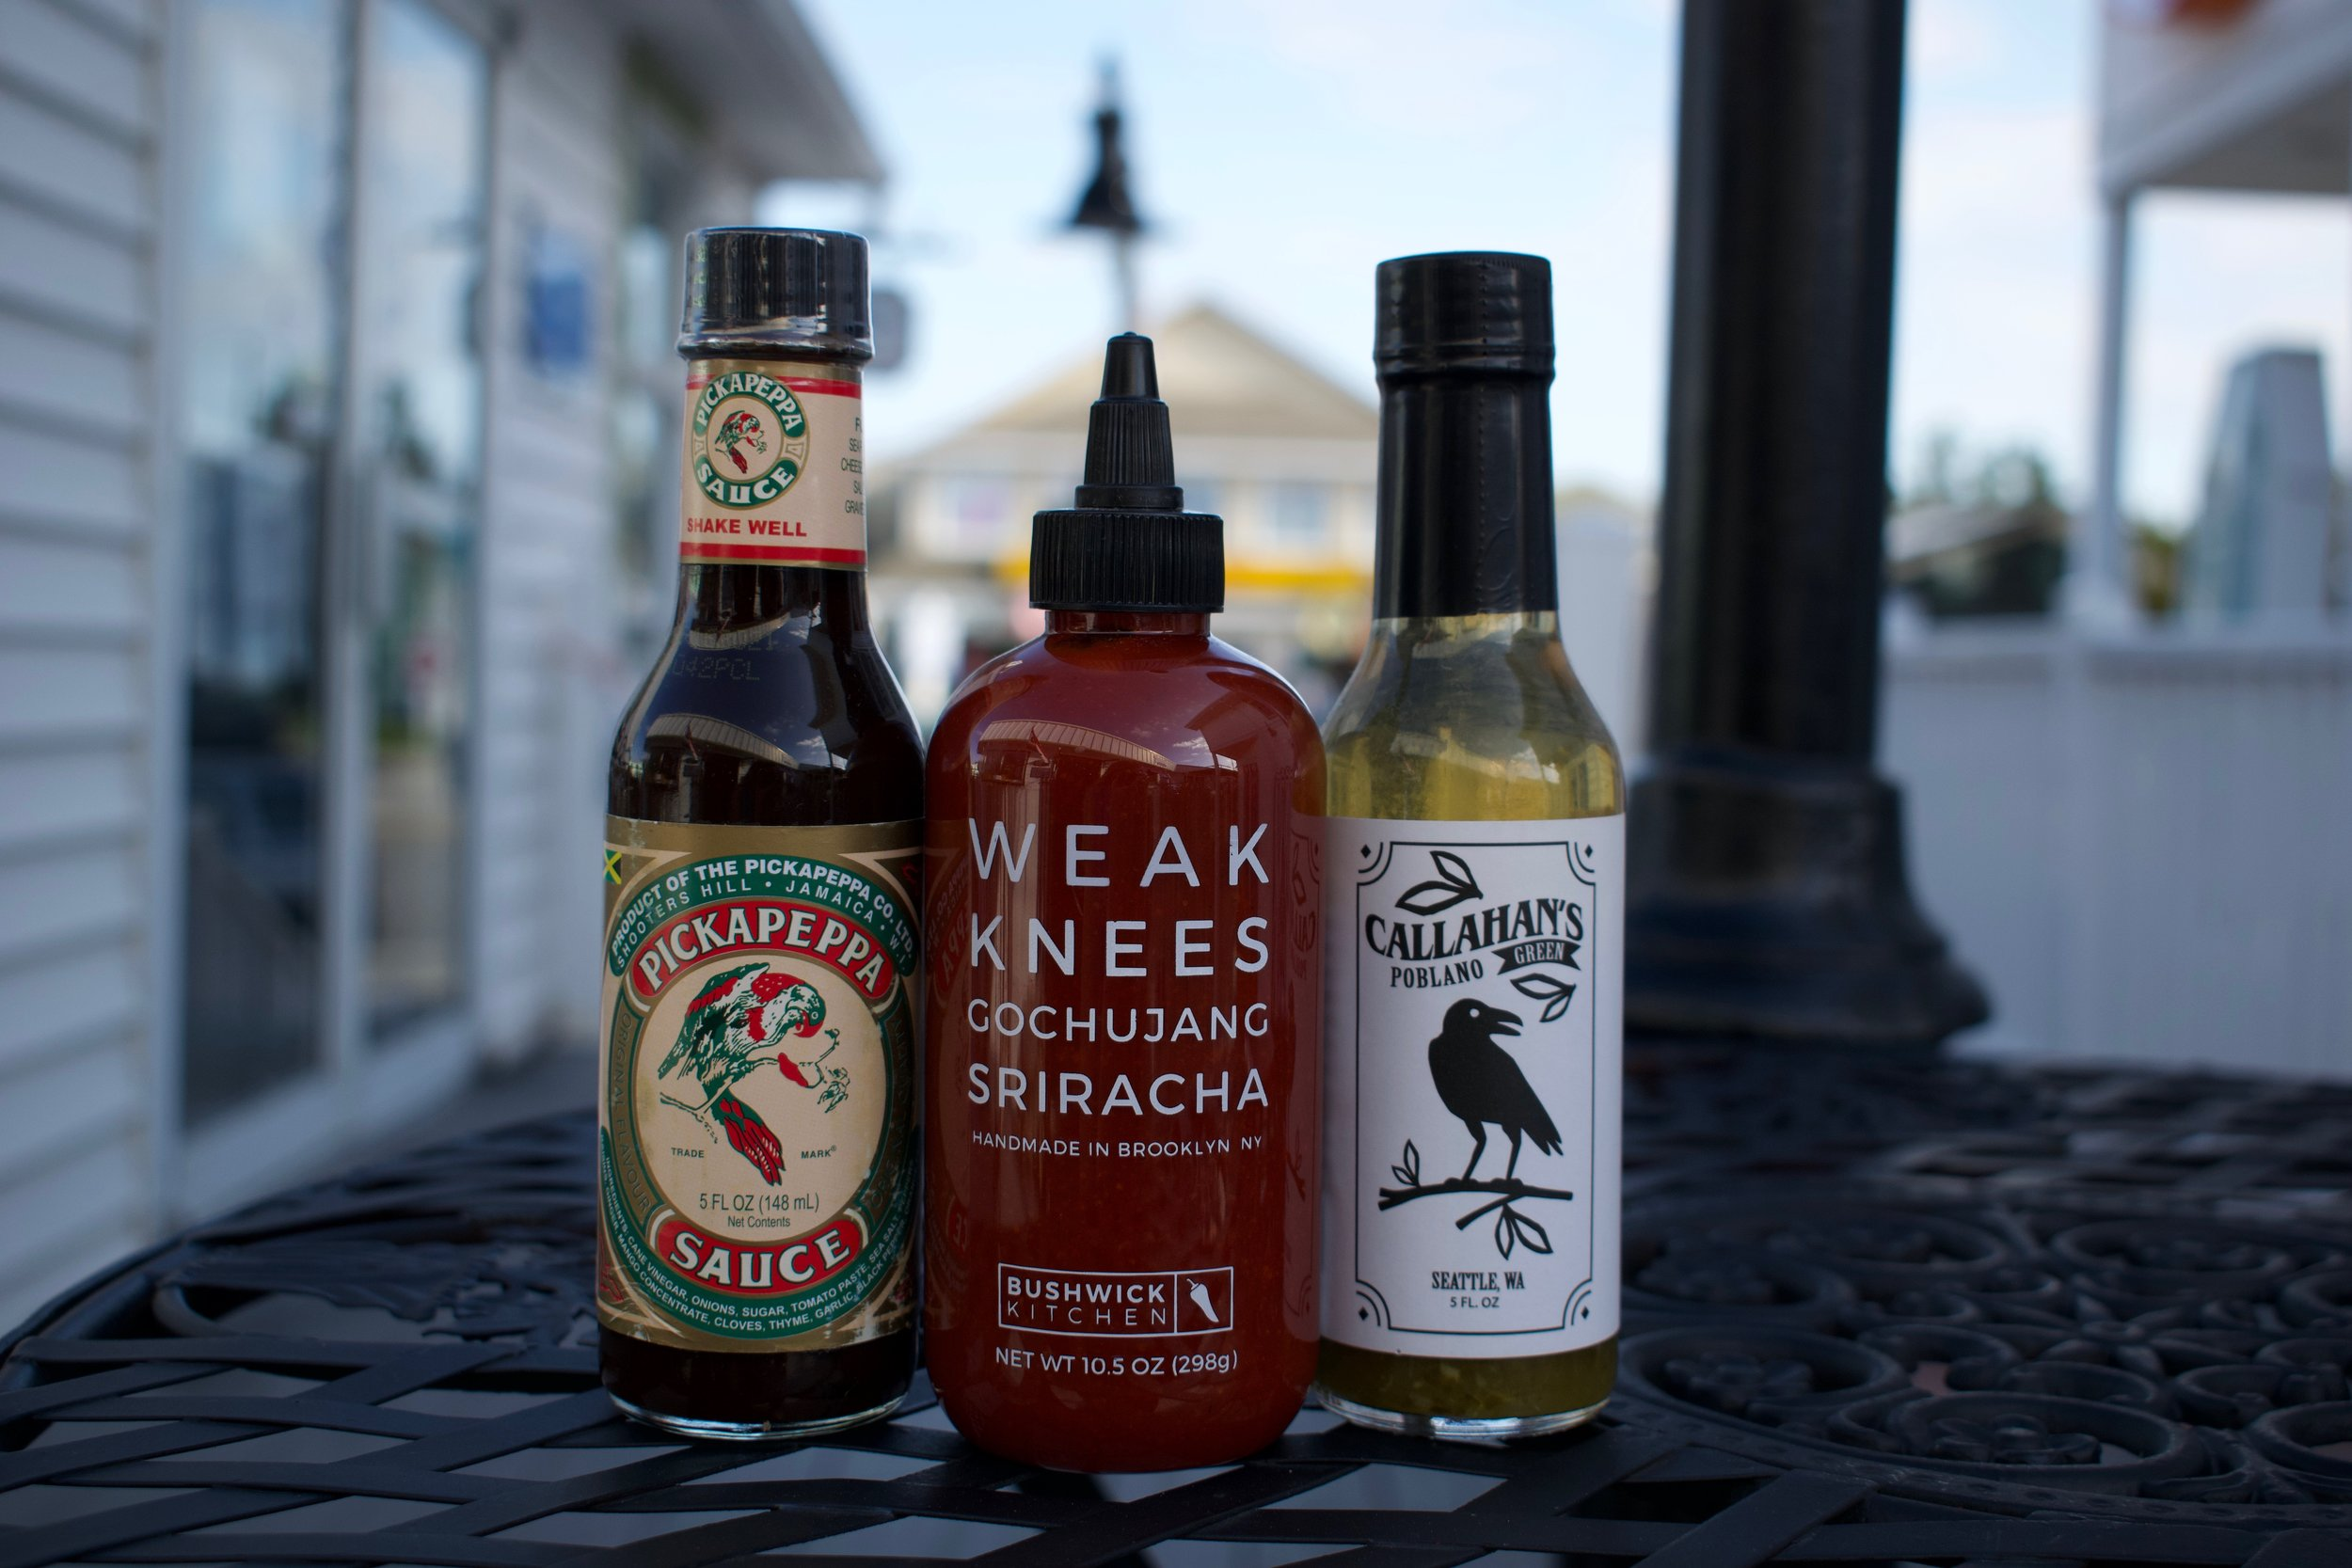 9. Extra hotness: Pickappeppa Sauce, Weak Knees Gochujang Sriracha, and Challahan's Poblano Green